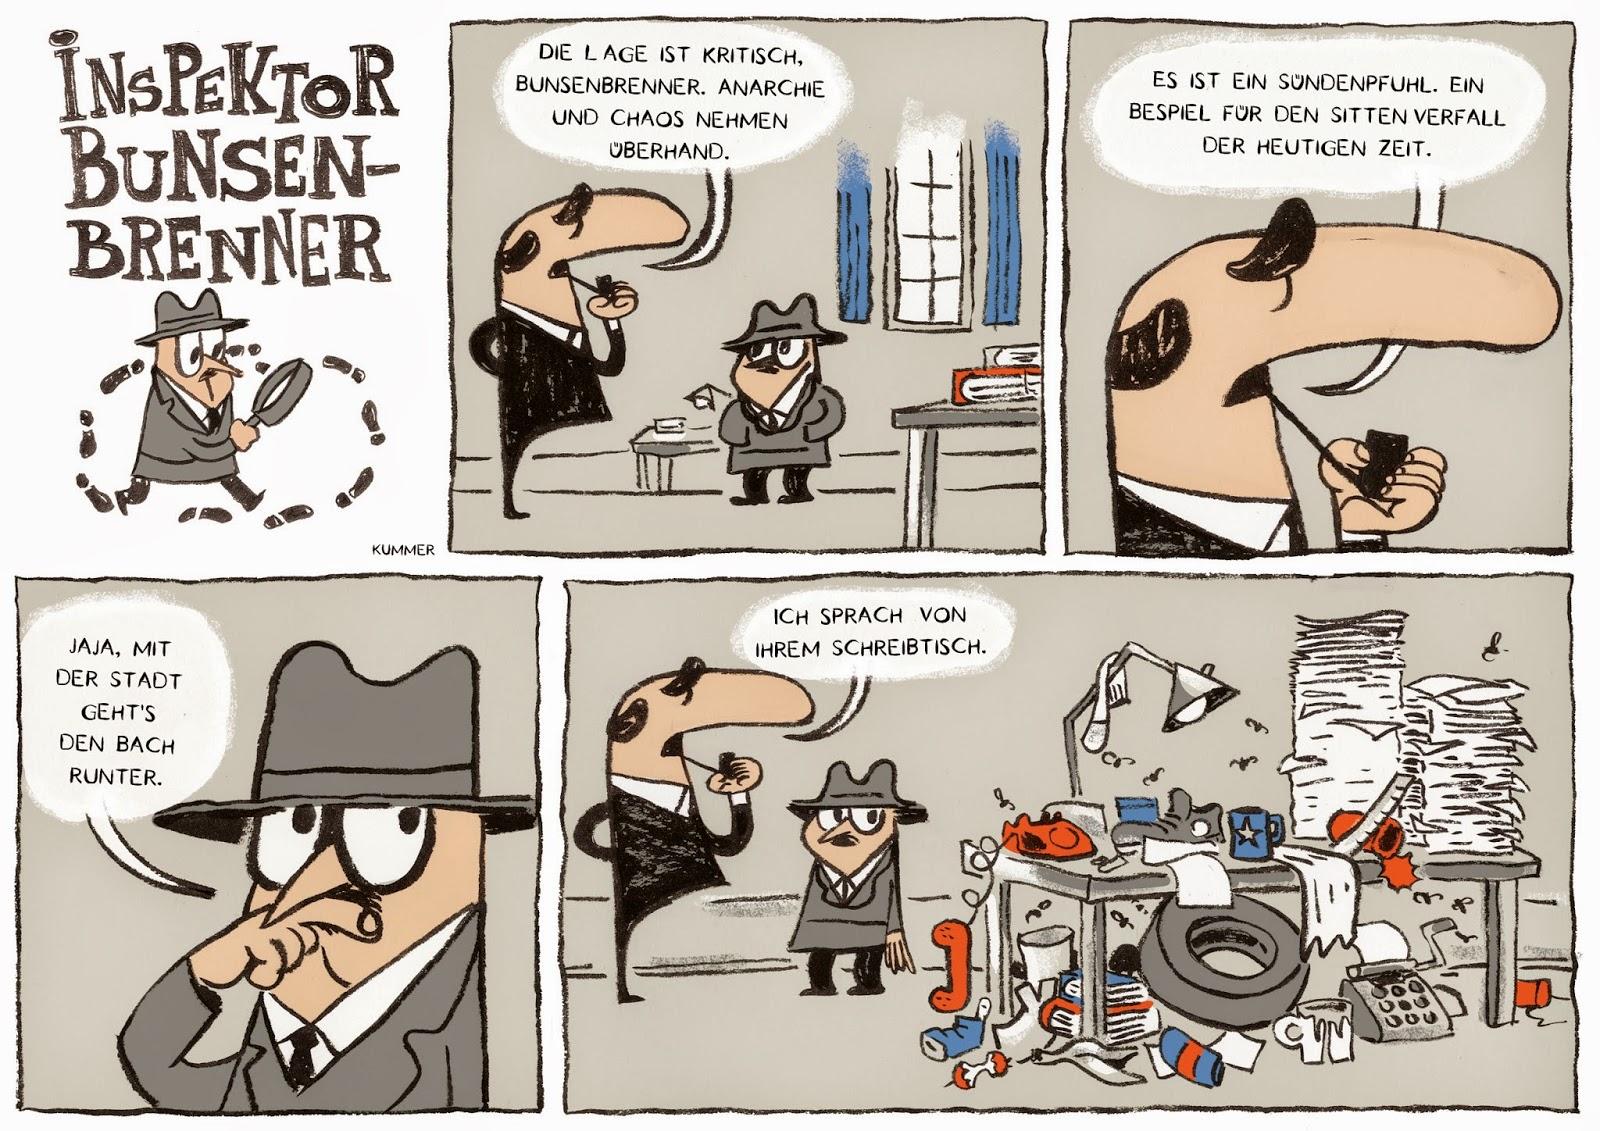 polizei, jpeg, comic, humor